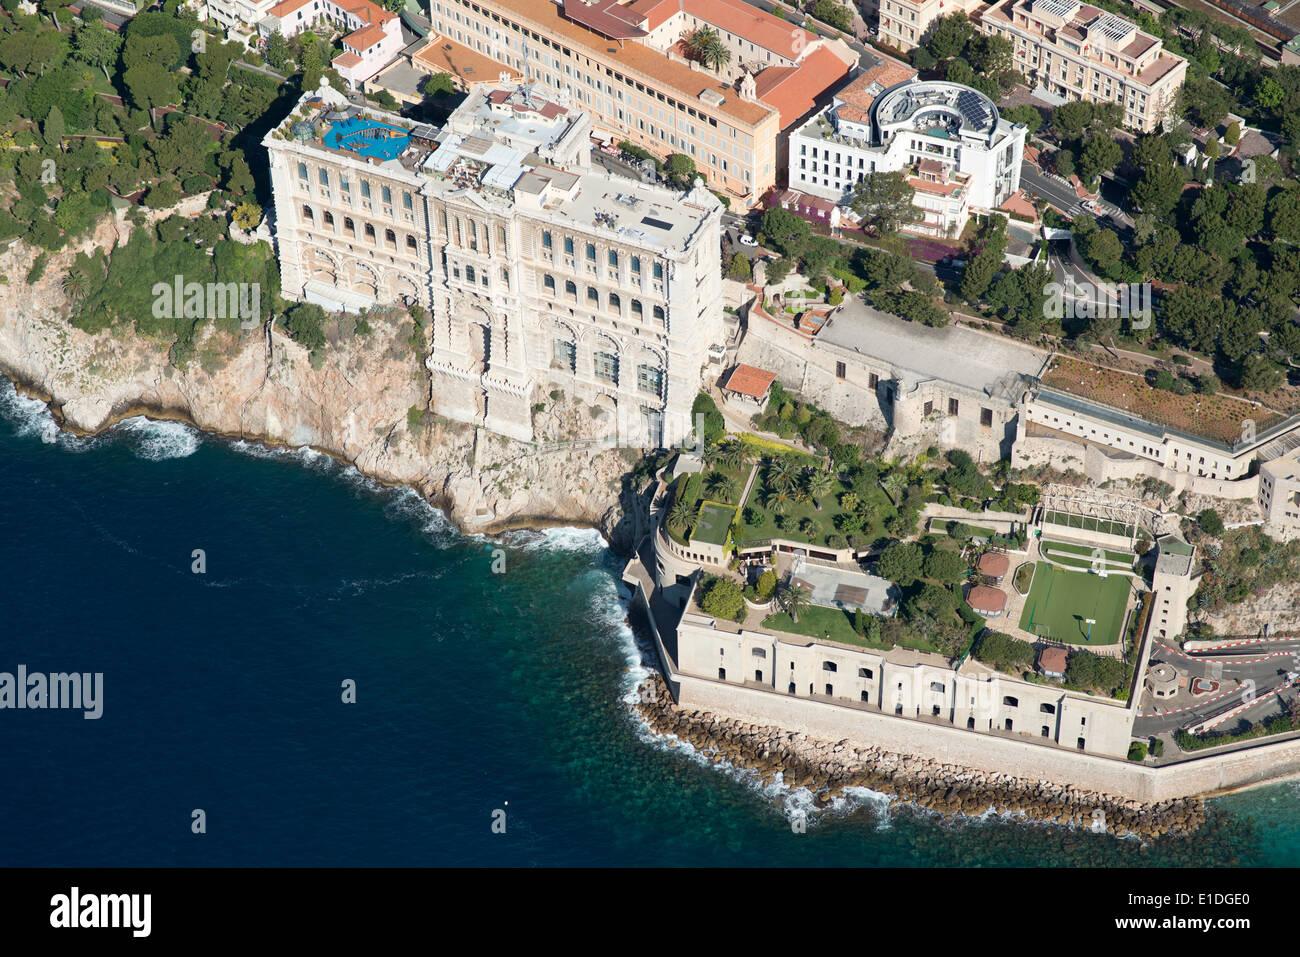 OCEANOGRAPHIC MUSEUM (aerial view). Monaco-Ville (aka The Rock), Principality of Monaco. - Stock Image